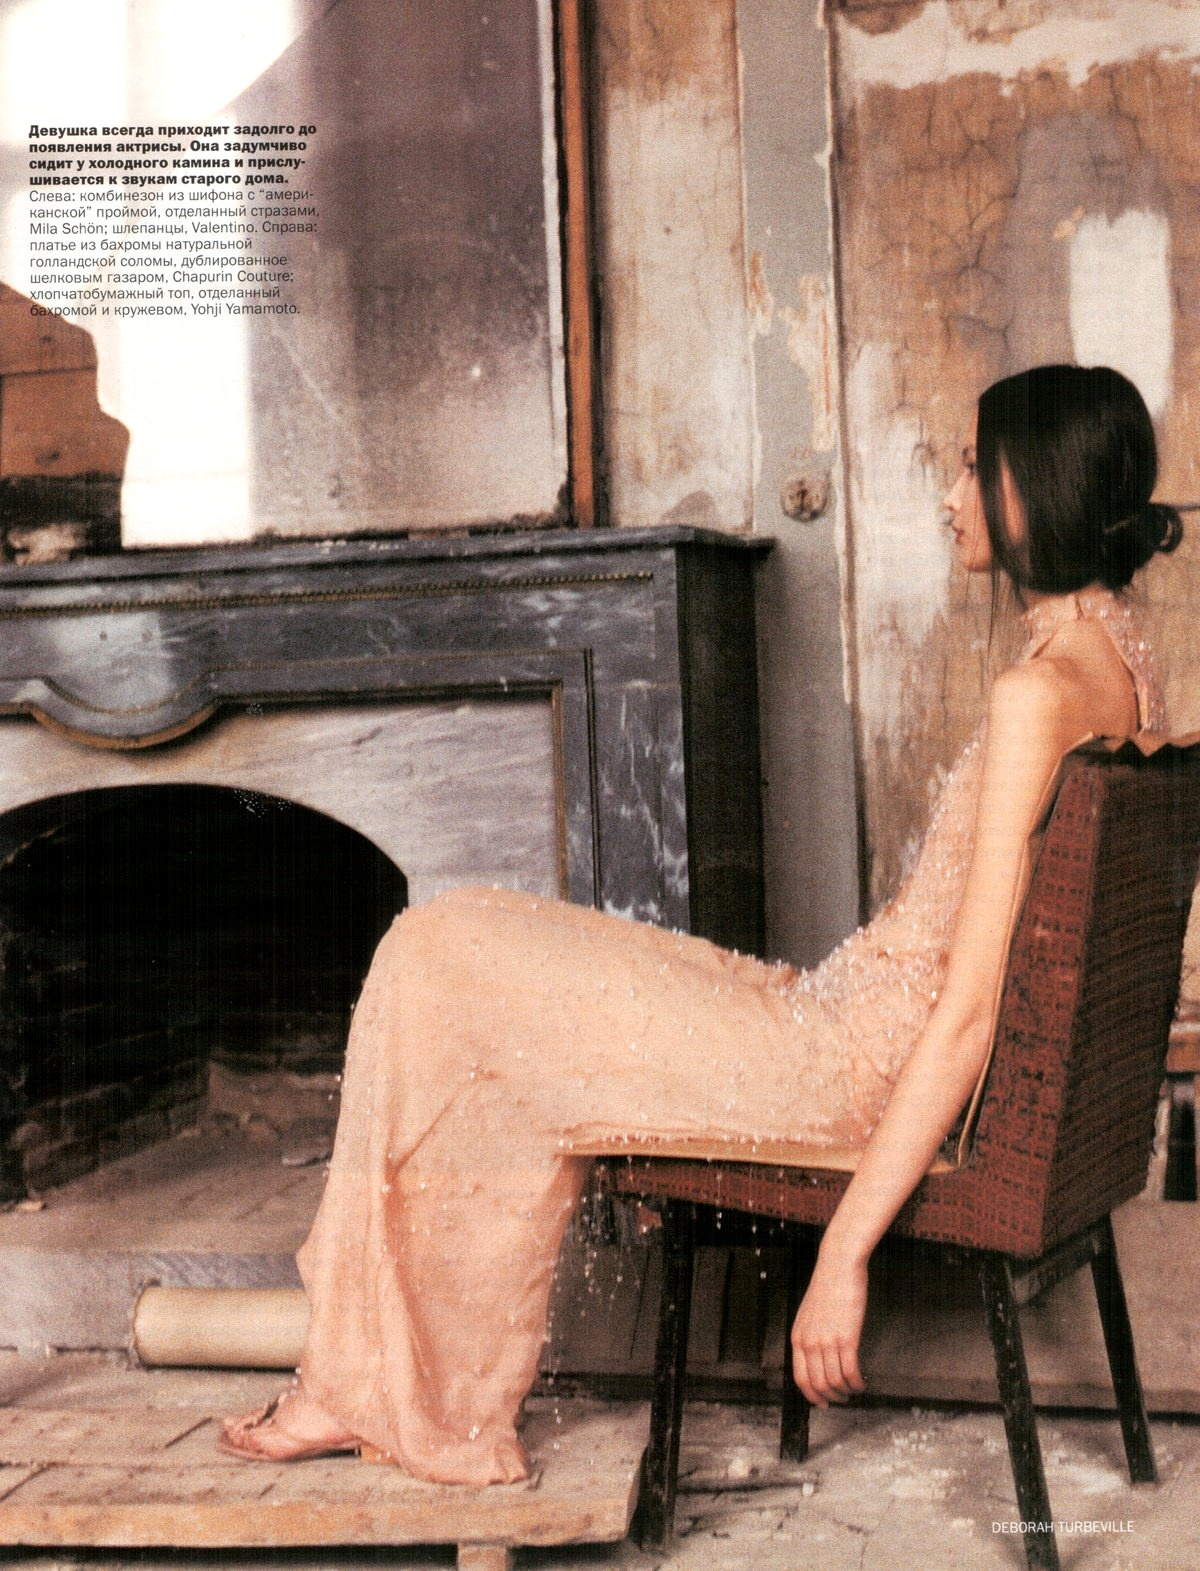 Mila Schon in Vogue Russia July/August 2000 (photography: Deborah Turbeville)